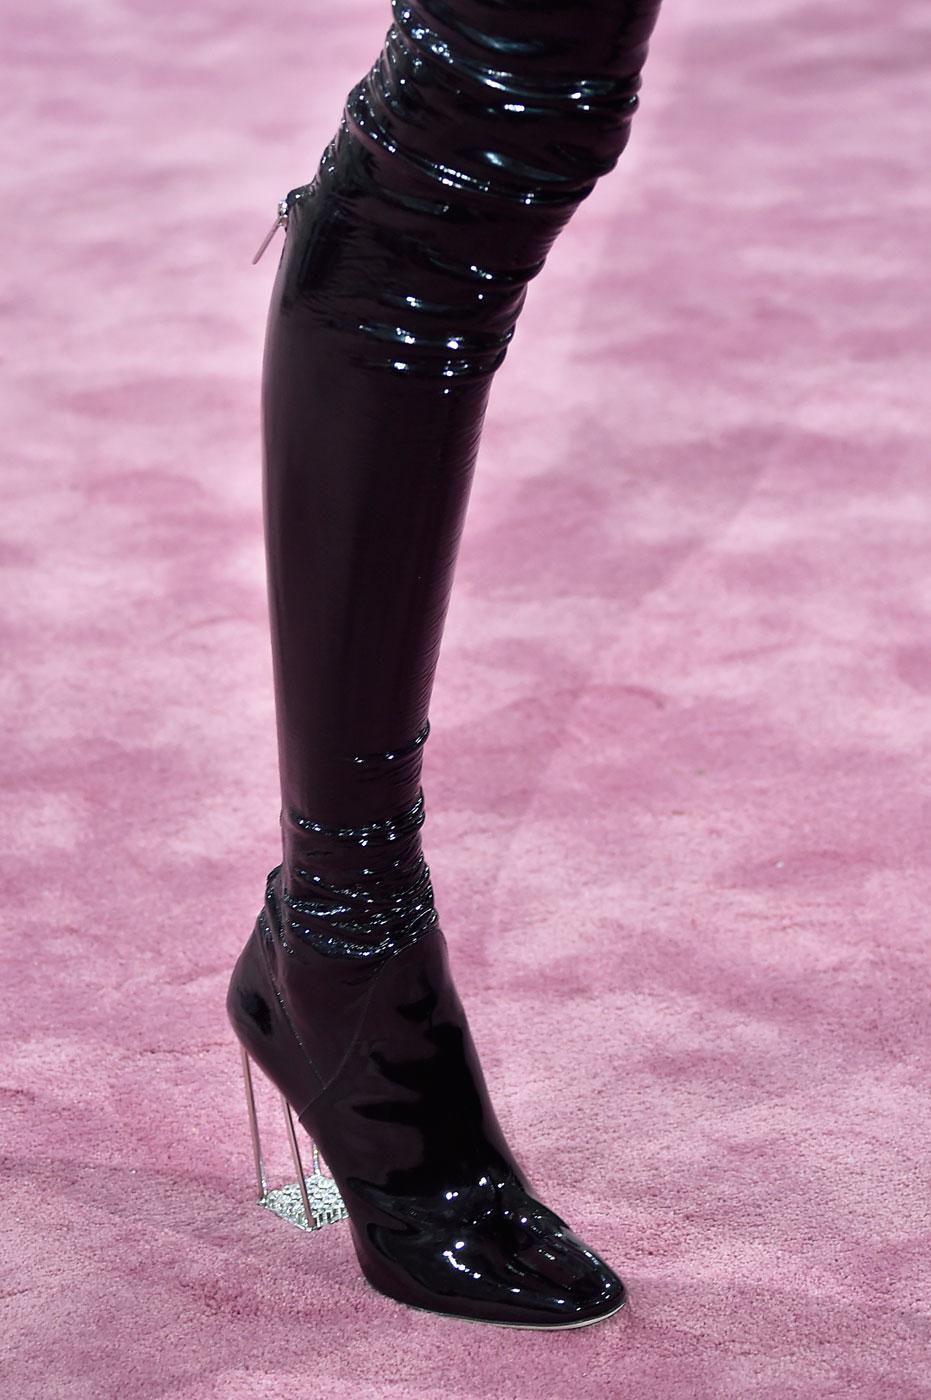 Christian-Dior-fashion-runway-show-close-ups-haute-couture-paris-spring-summer-2015-the-impression-024